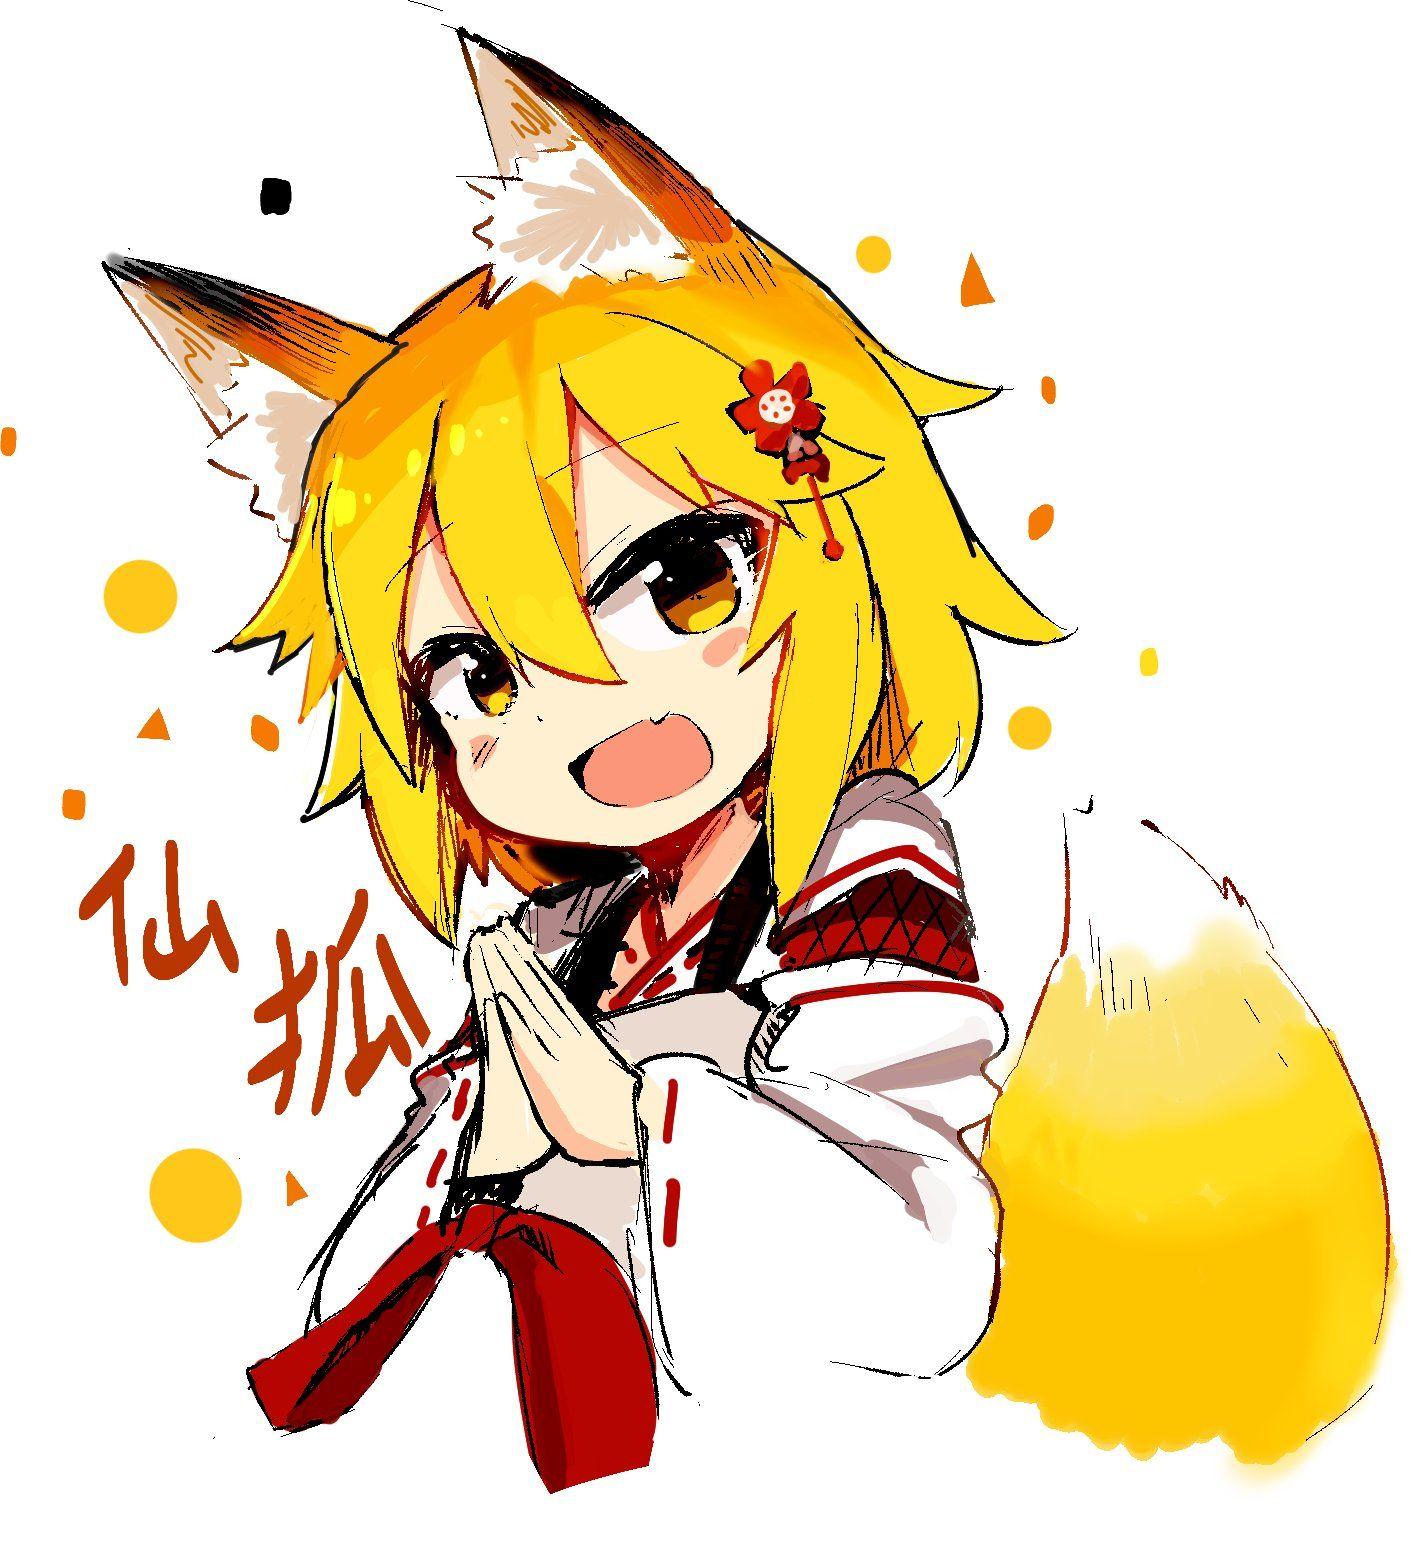 Sewayaki Kitsune no Senkosan Cute neko girl, Kawaii